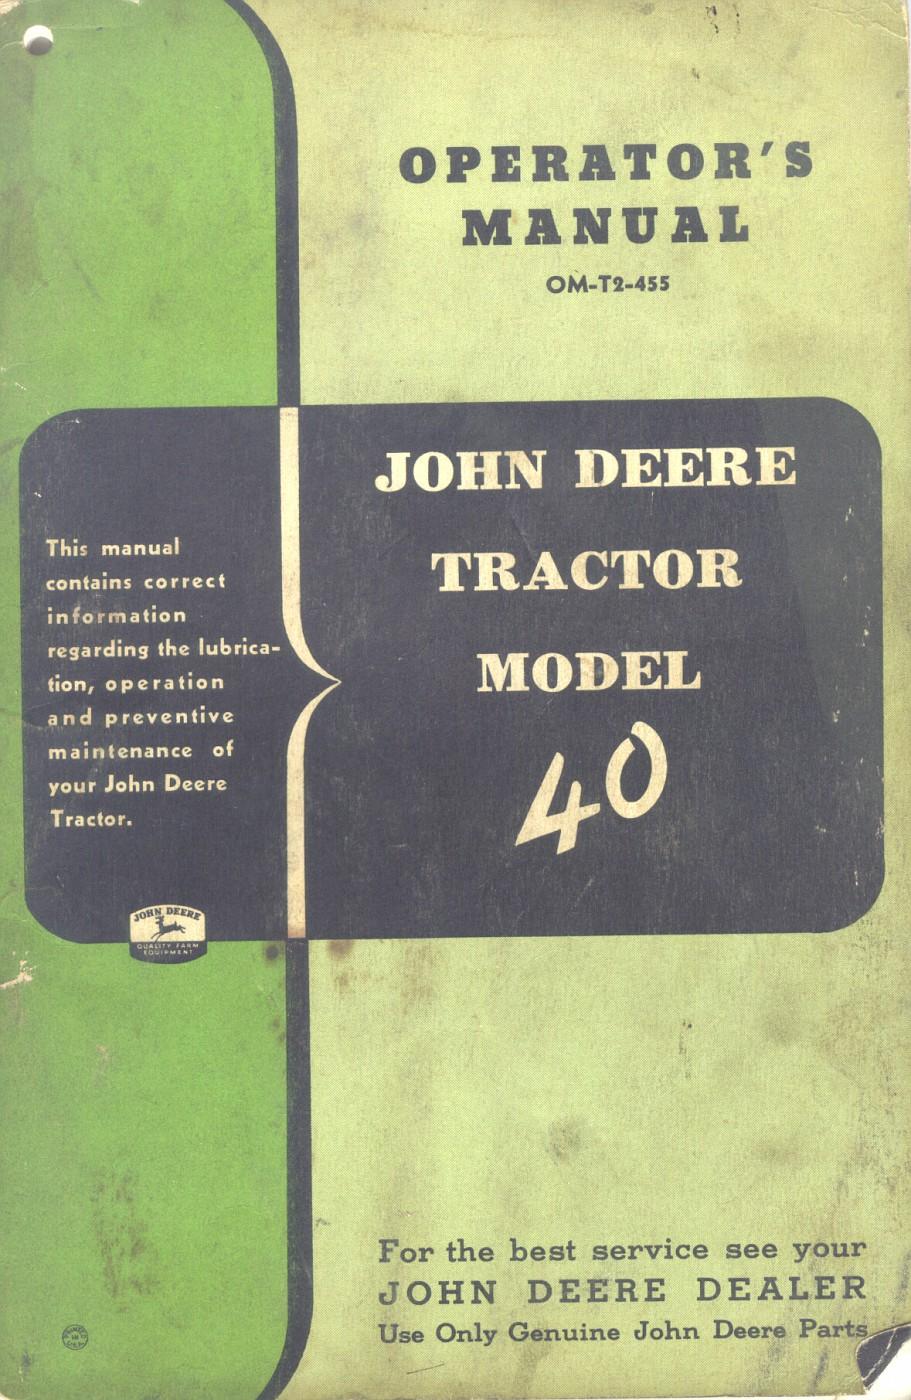 John Deere Tractor Model 40 Operator's Manual